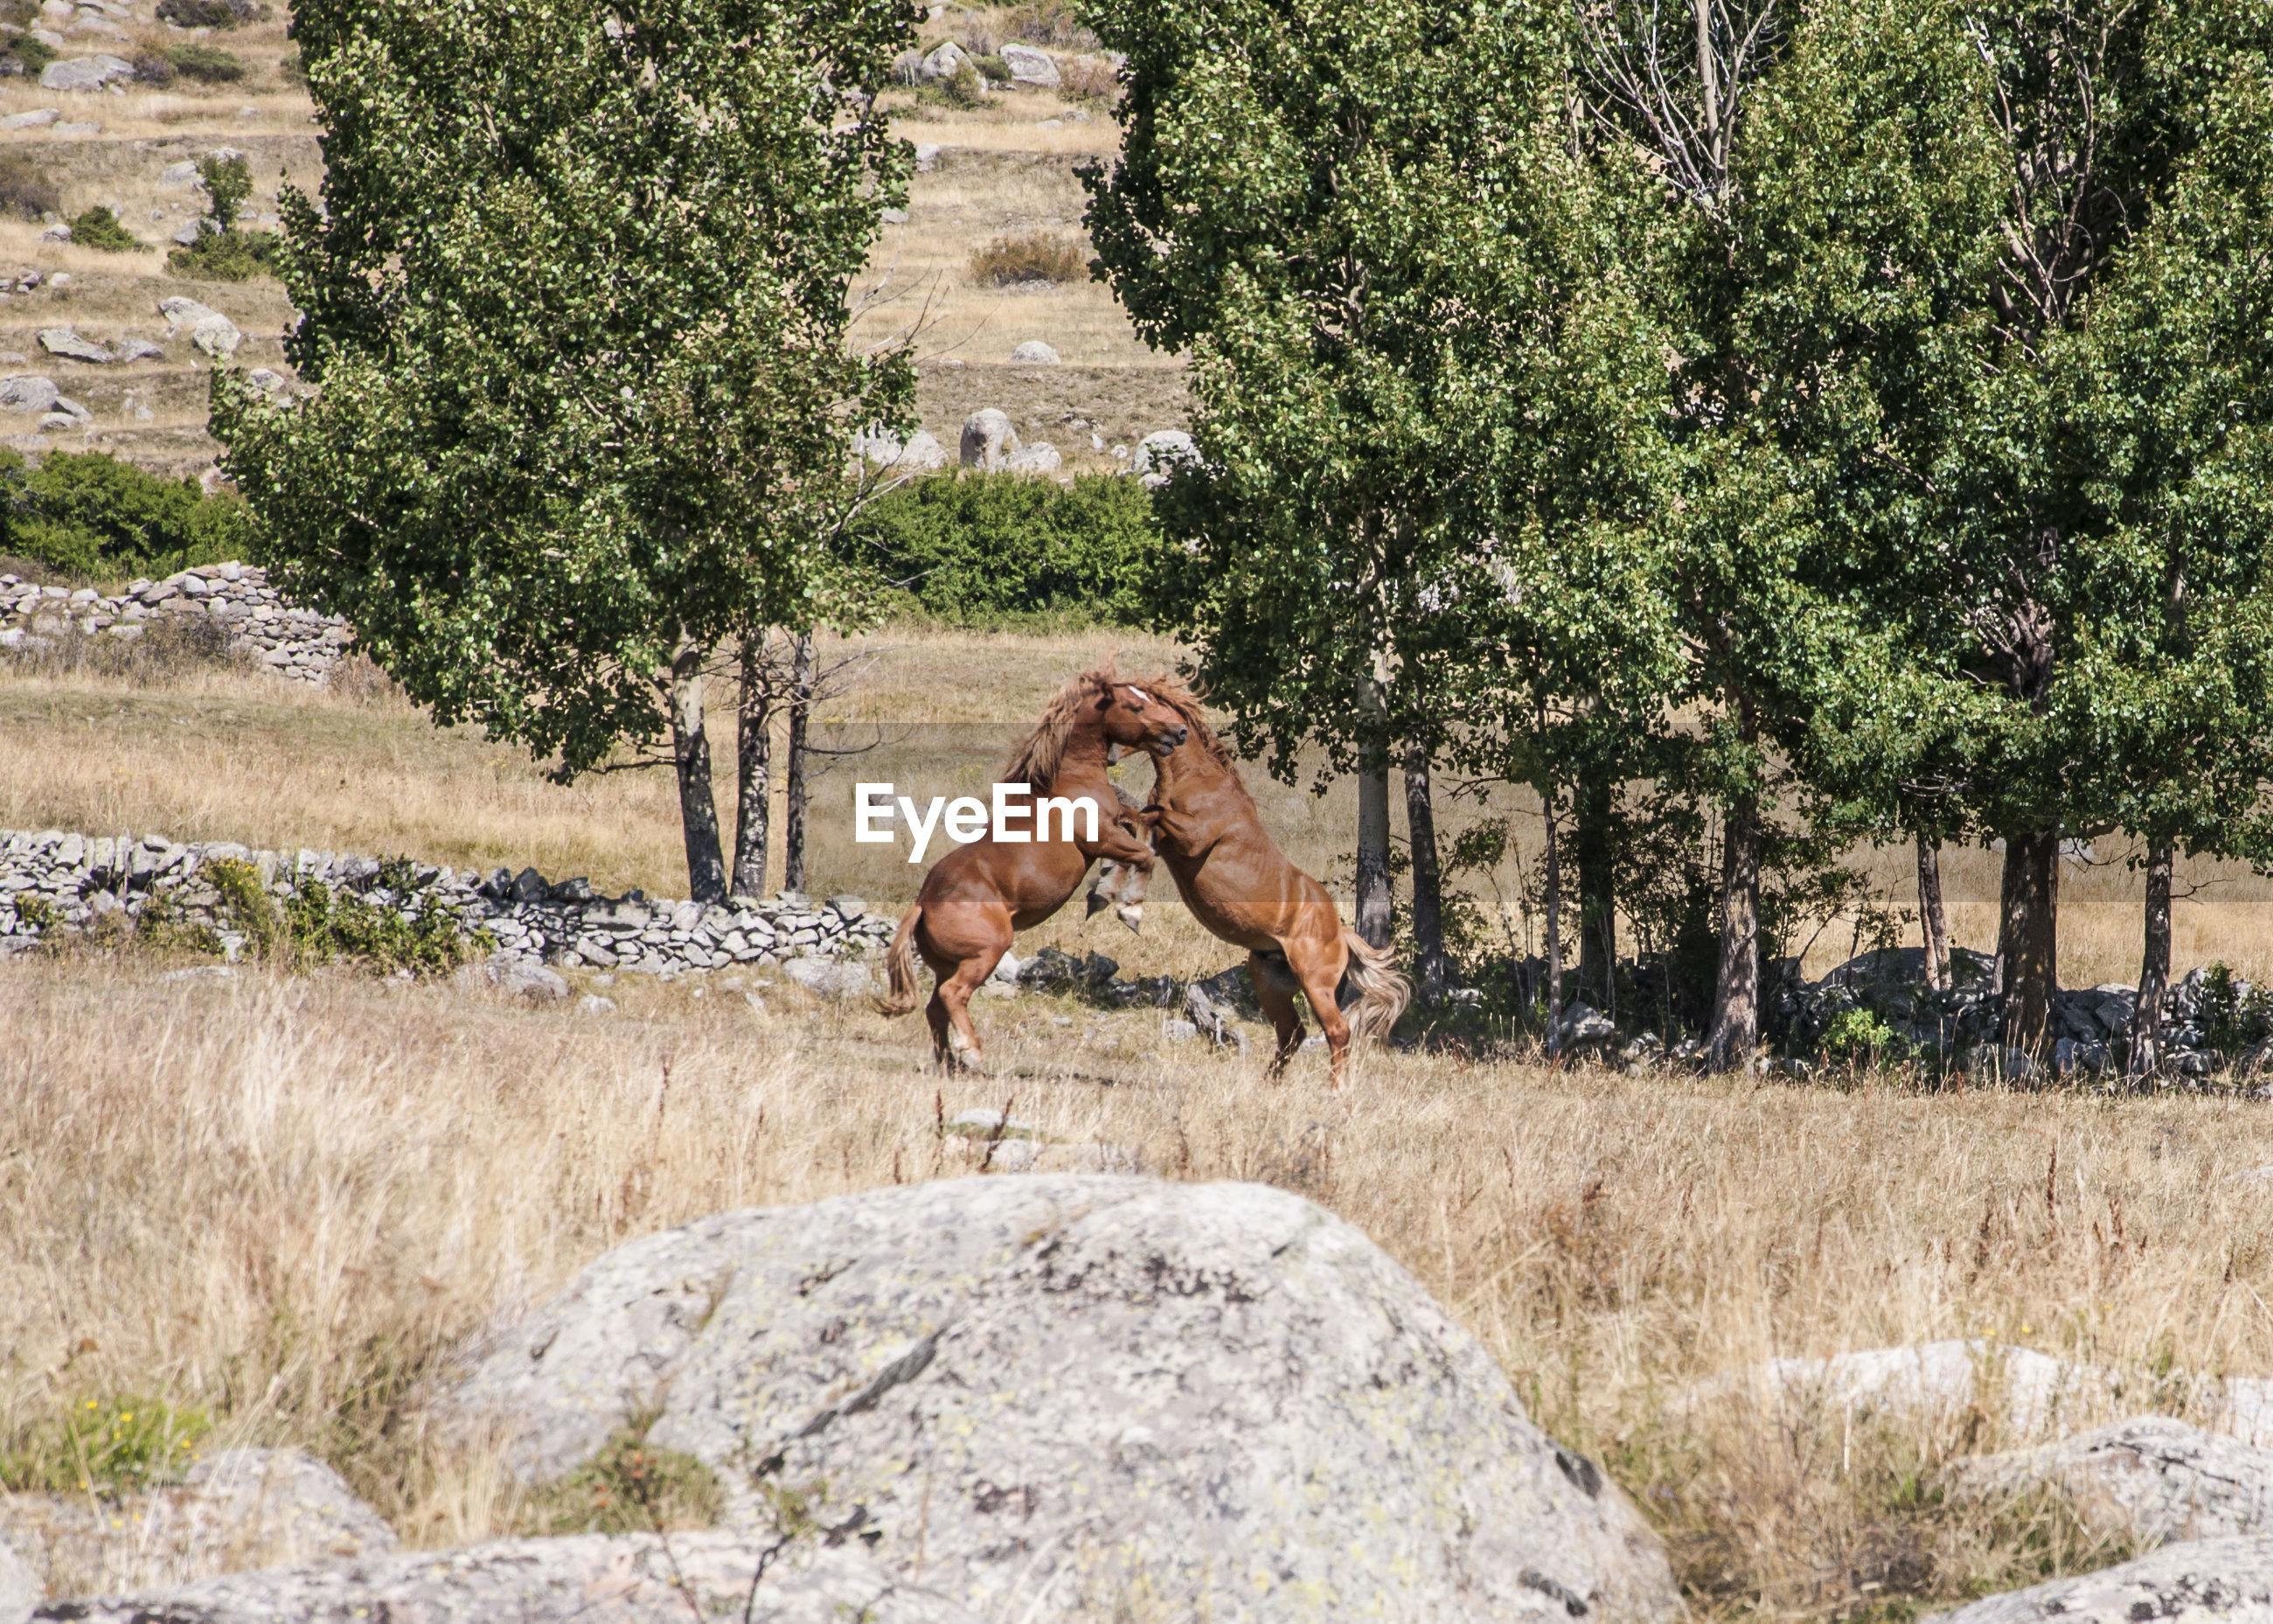 Horses fighting on field